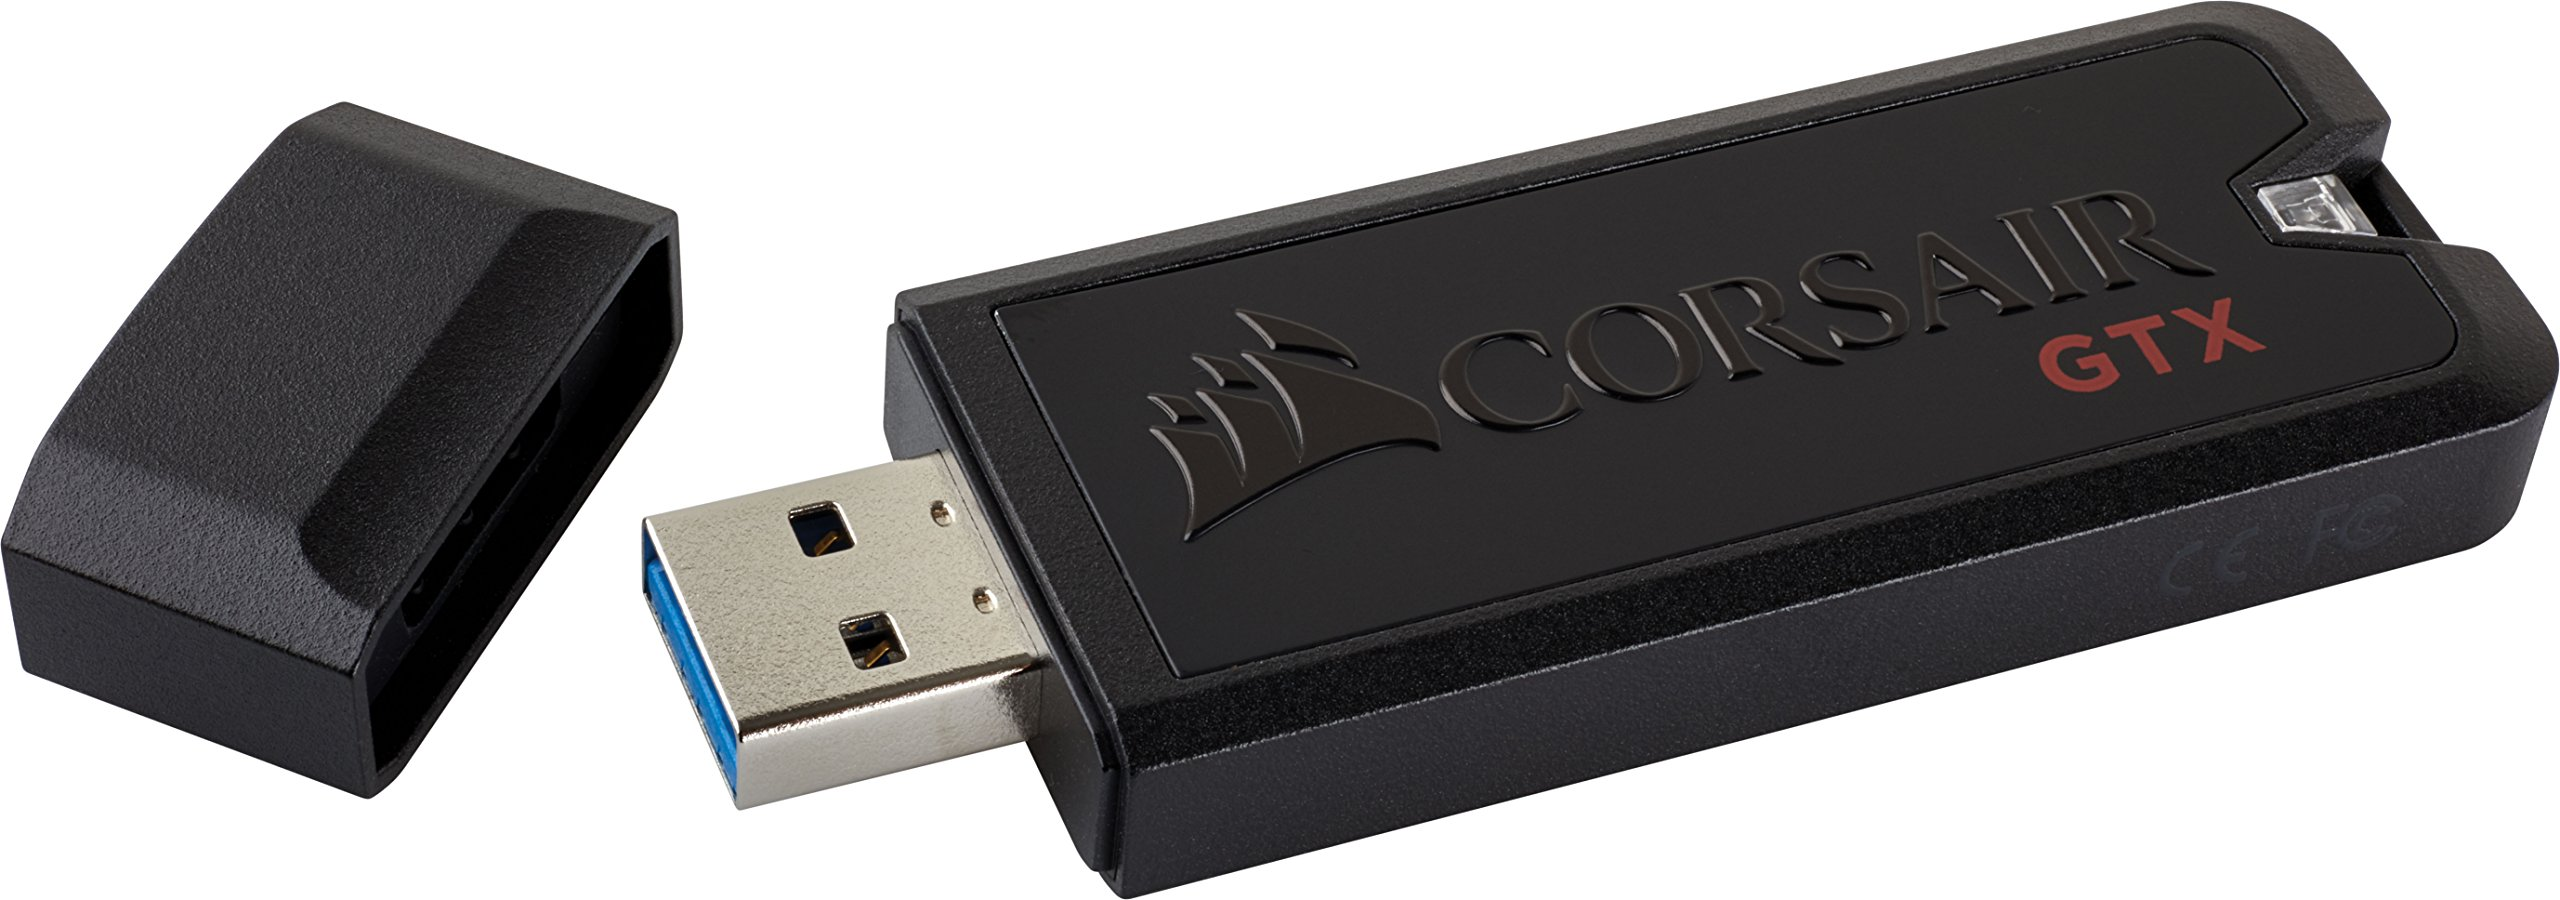 Corsair Flash Voyager GTX 128GB USB 3.1 Premium Flash Drive by Corsair (Image #4)